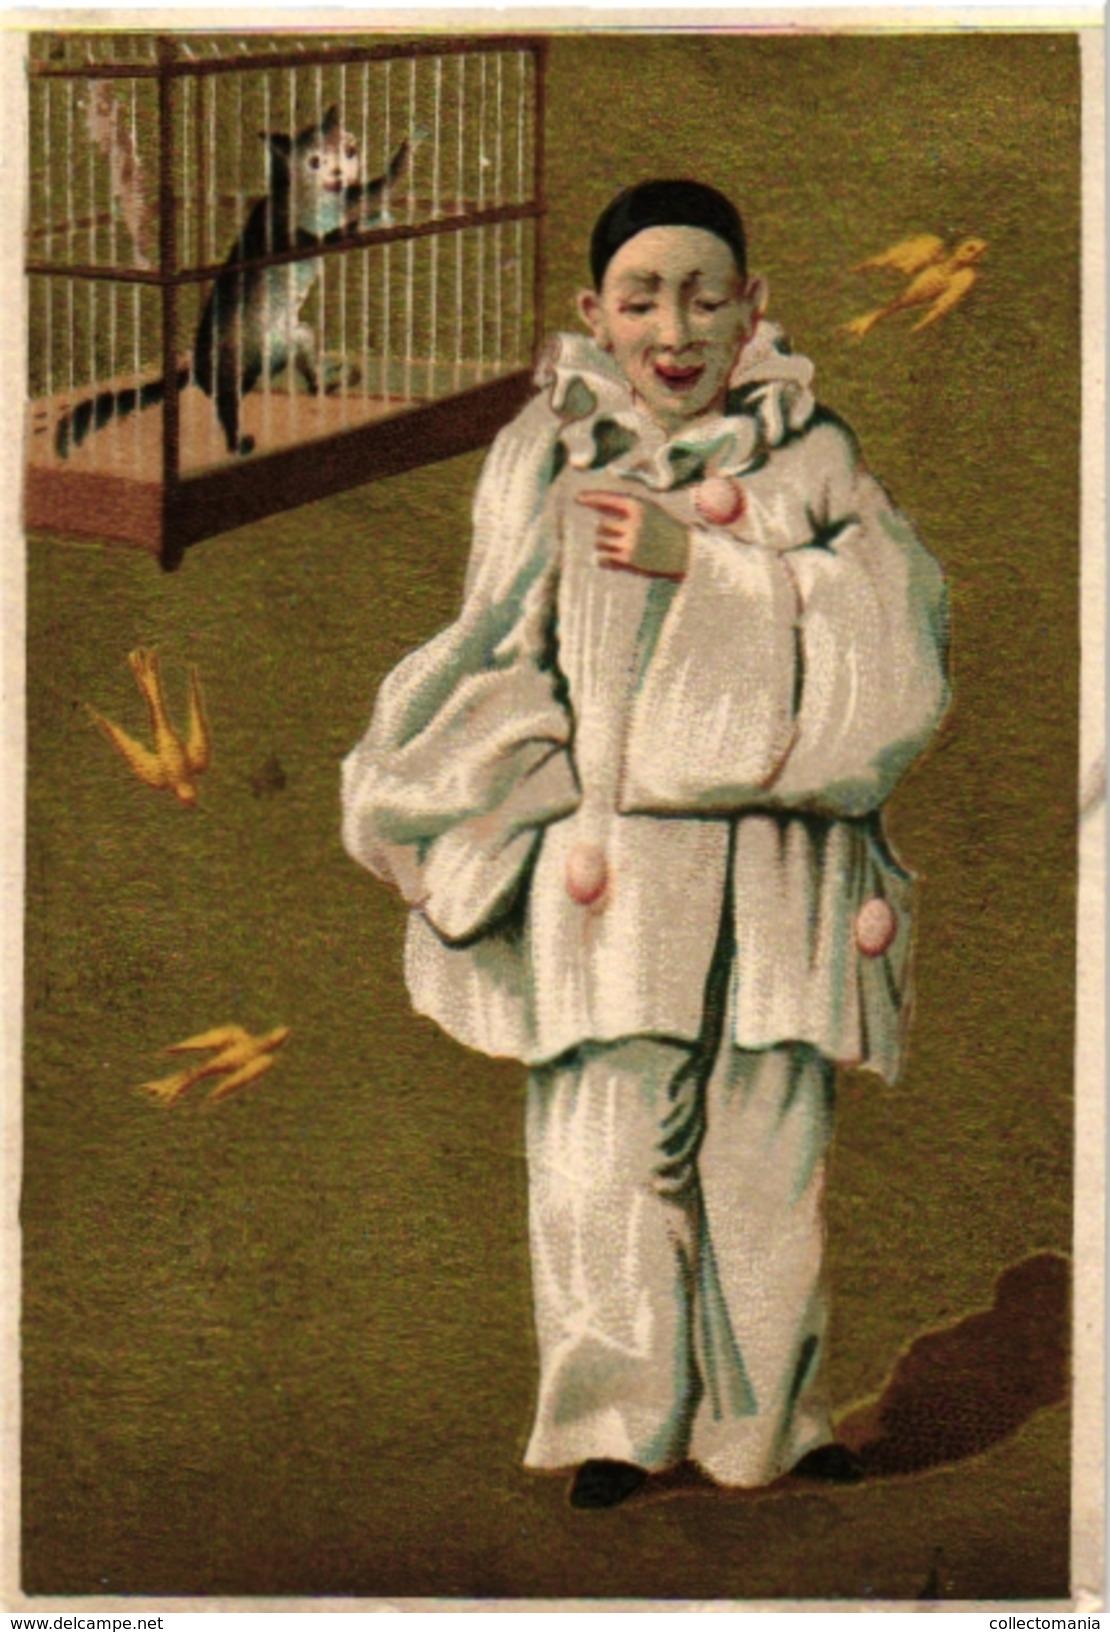 6 Litho Cards C1900 Litho Pierrot Fishing Cat Papillons Hare Fond Dorée Blanco Reverse SET Complete VERY Good - RARE - Chromos